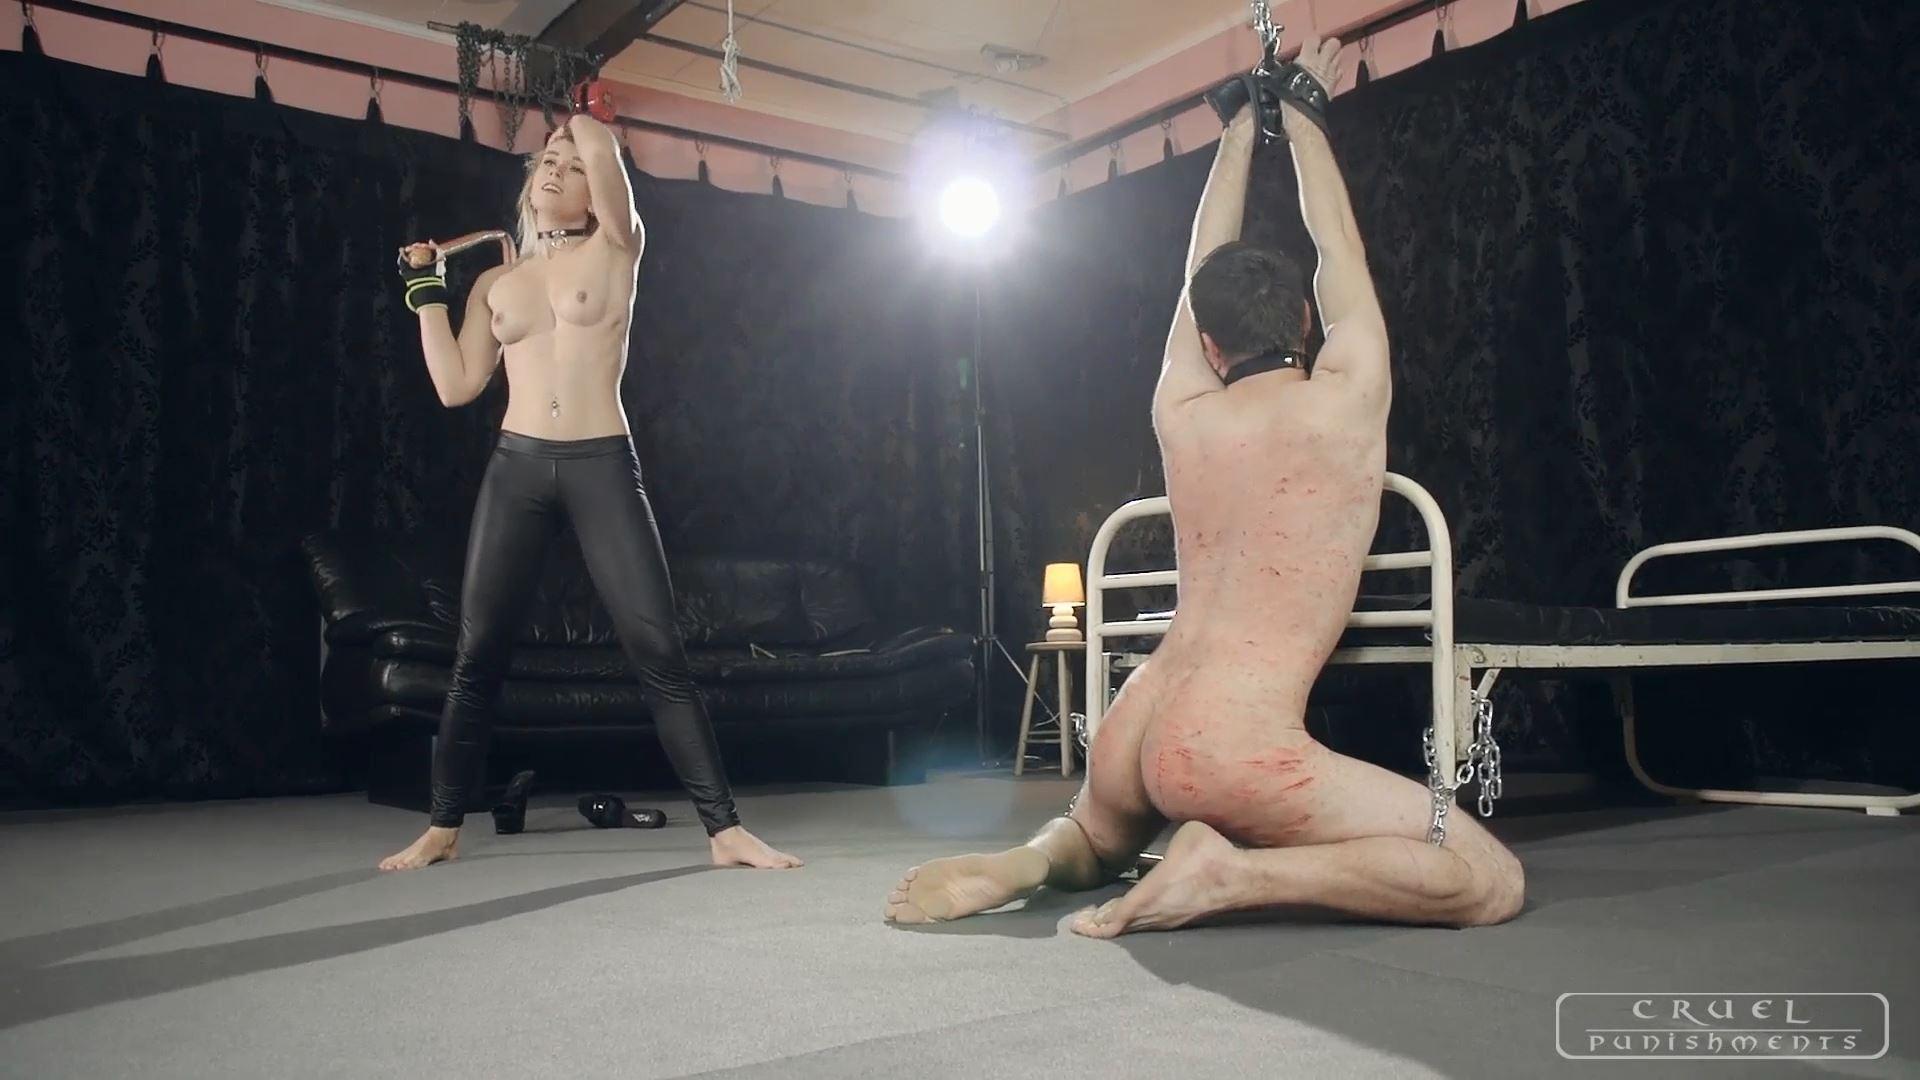 Mistress Anette In Scene: Anette's powerful session Part 2 - CRUEL PUNISHMENTS - SEVERE FEMDOM - FULL HD/1080p/MP4